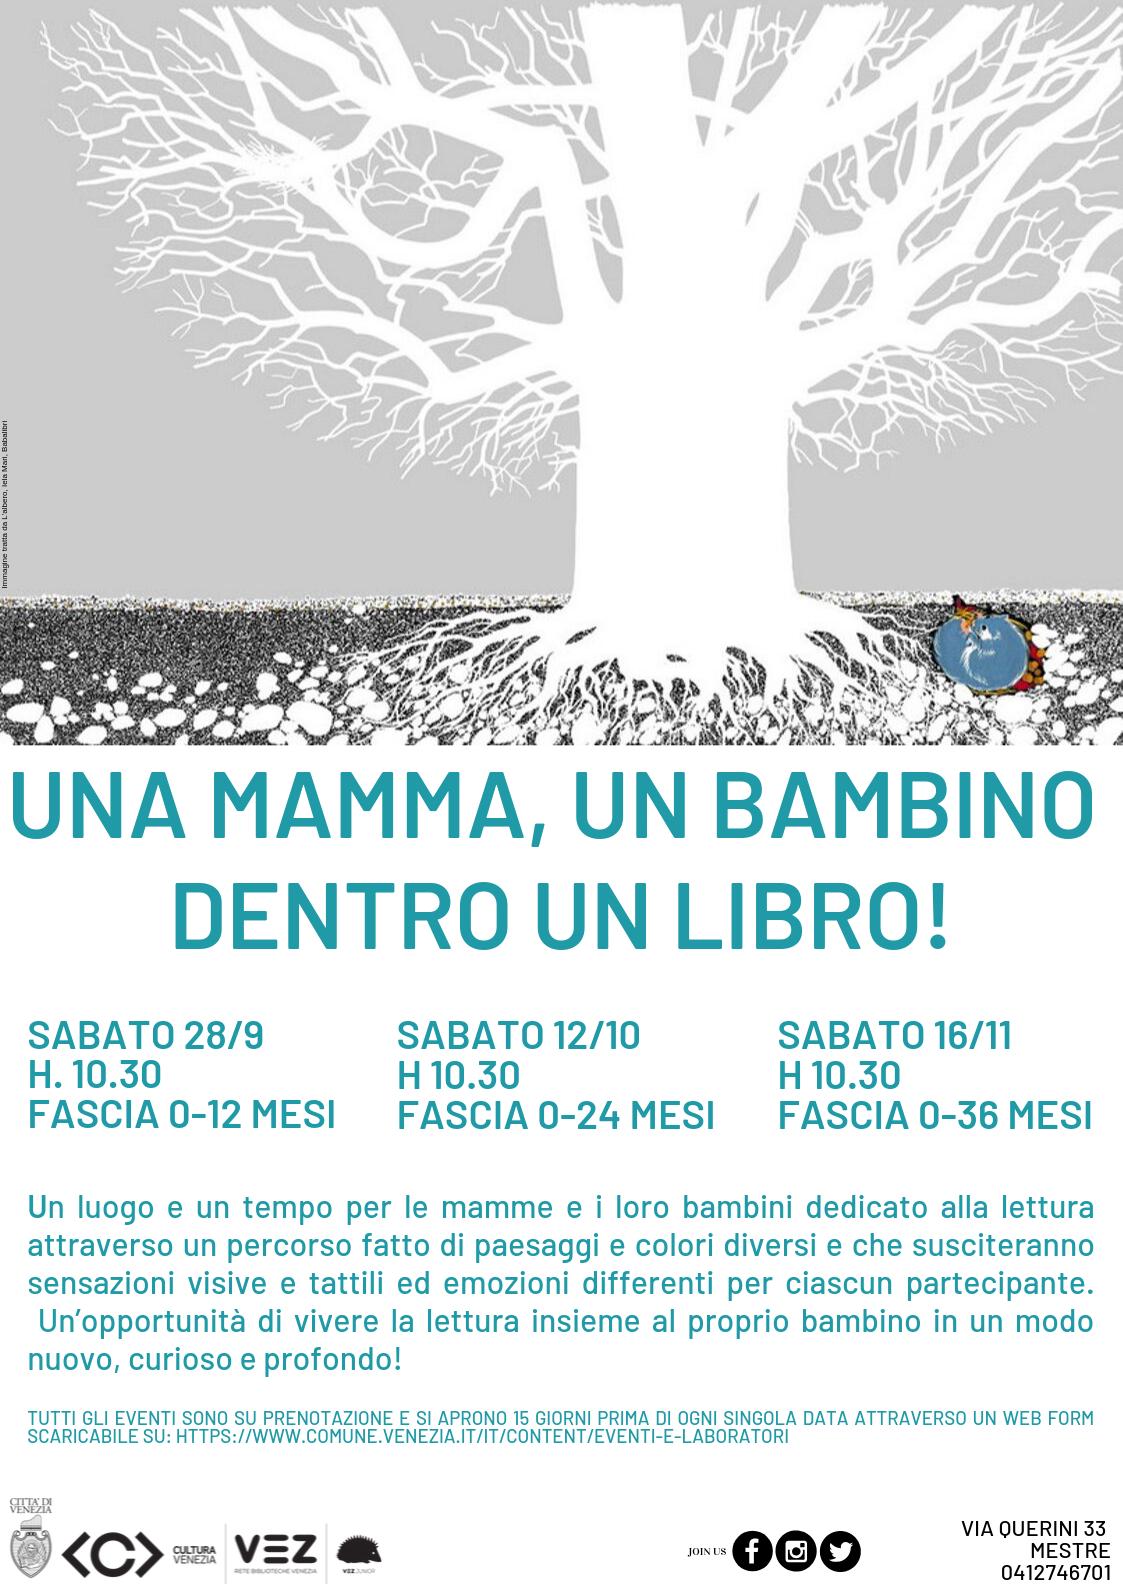 Una mamma, un bambino dentro un libro